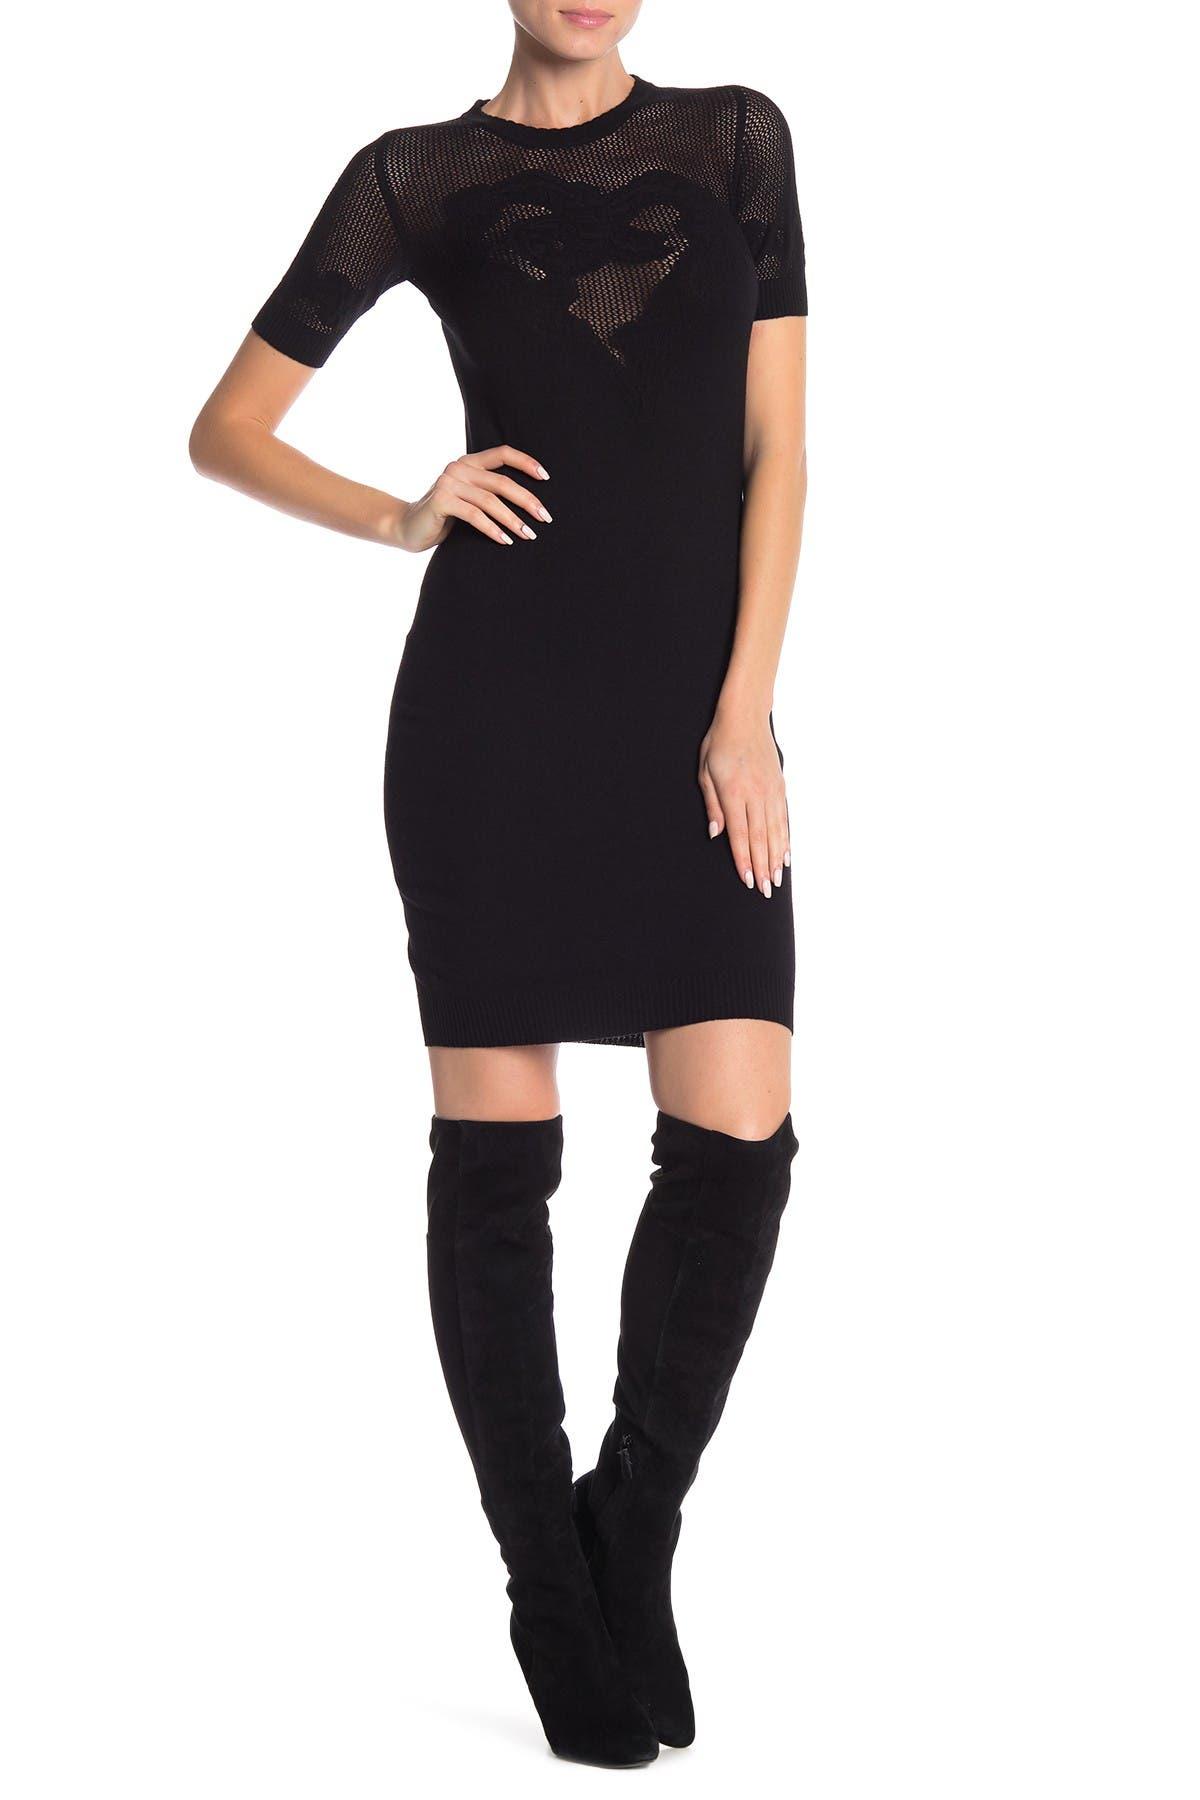 Image of LOVE Moschino Short Sleeve Knit Dress